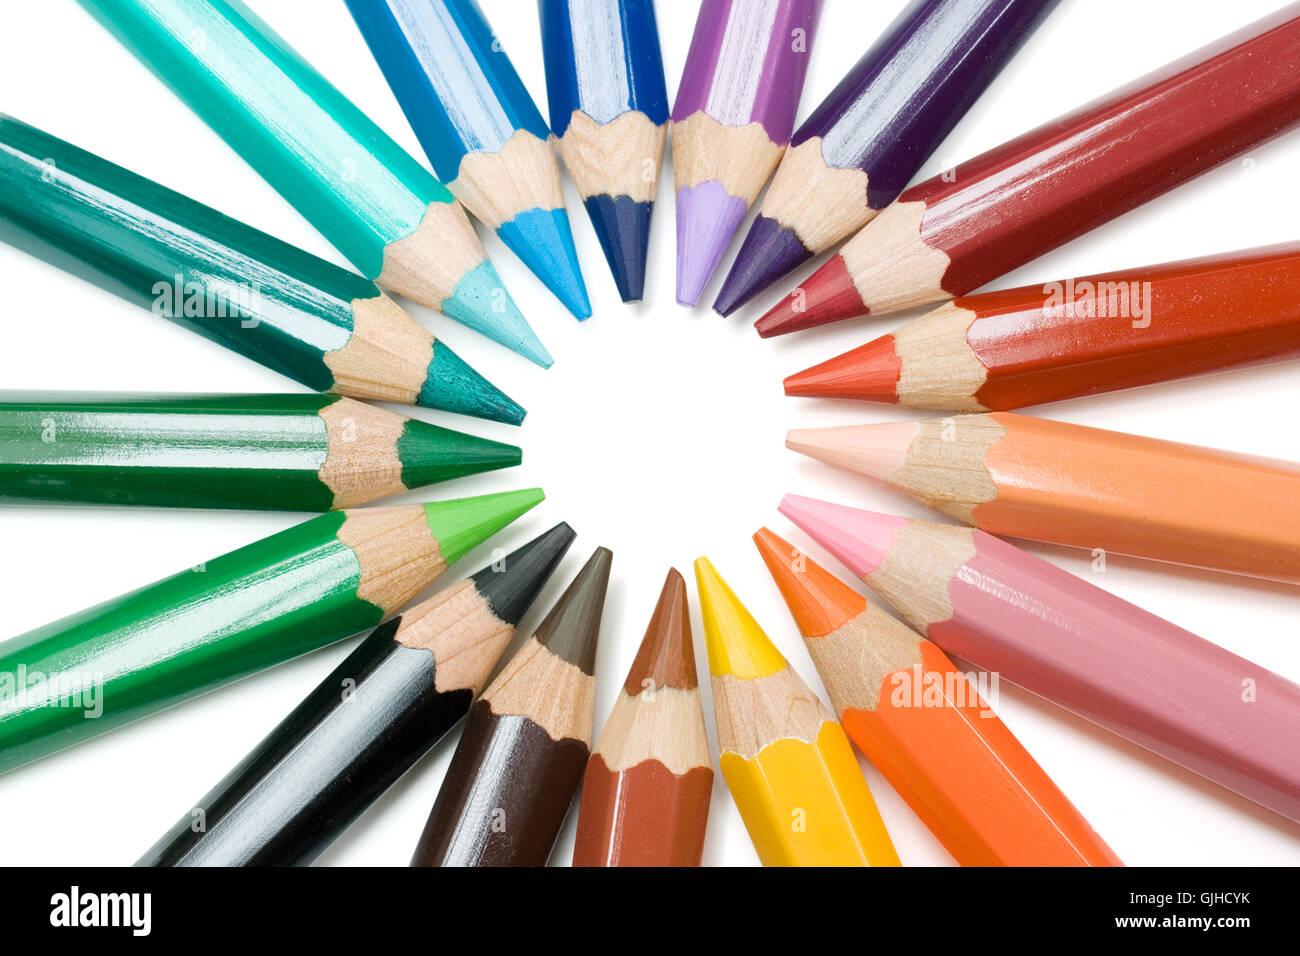 color spectrum - Stock Image